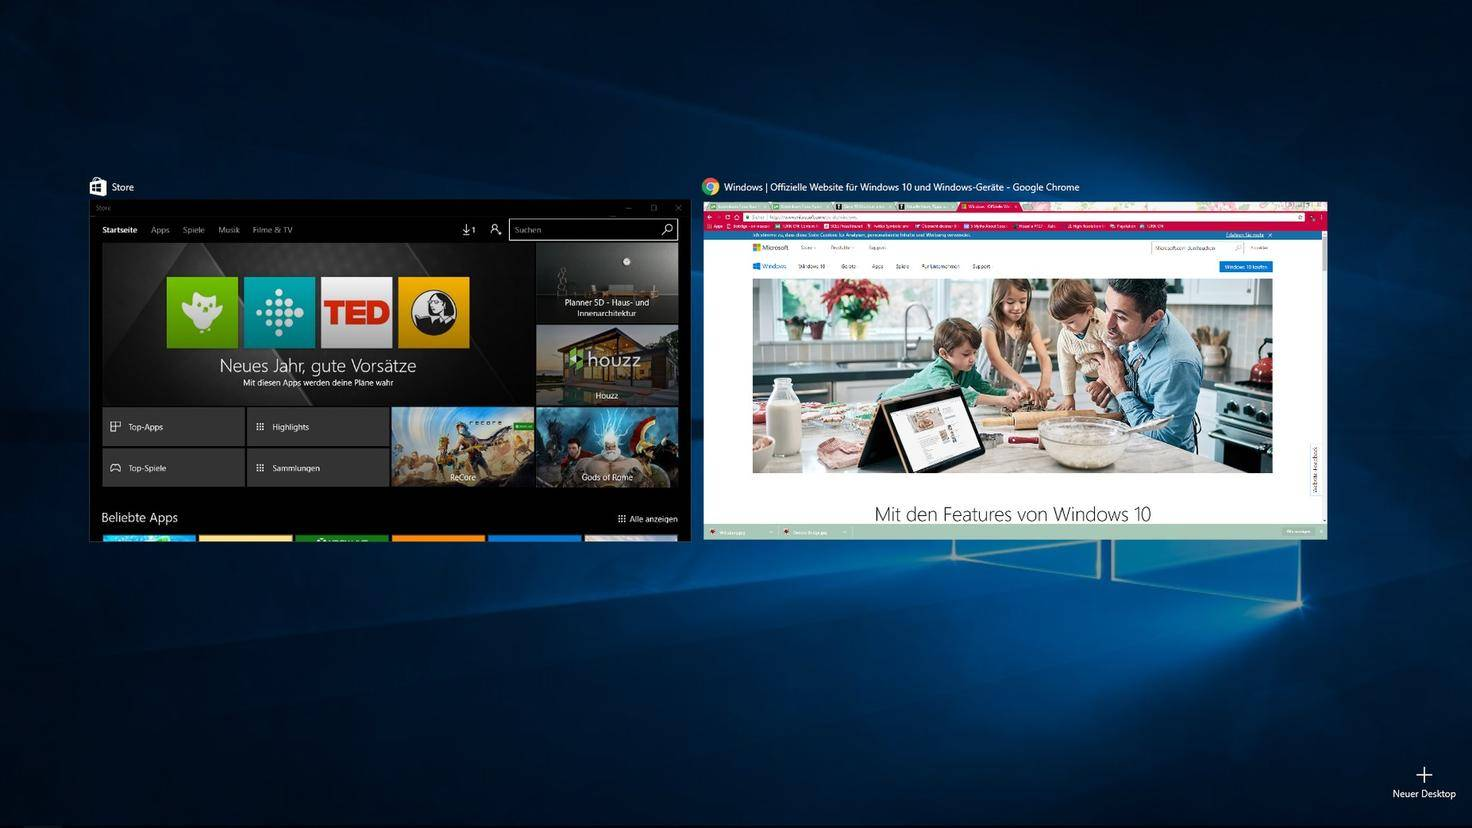 Windows 10 Mehrere Desktops